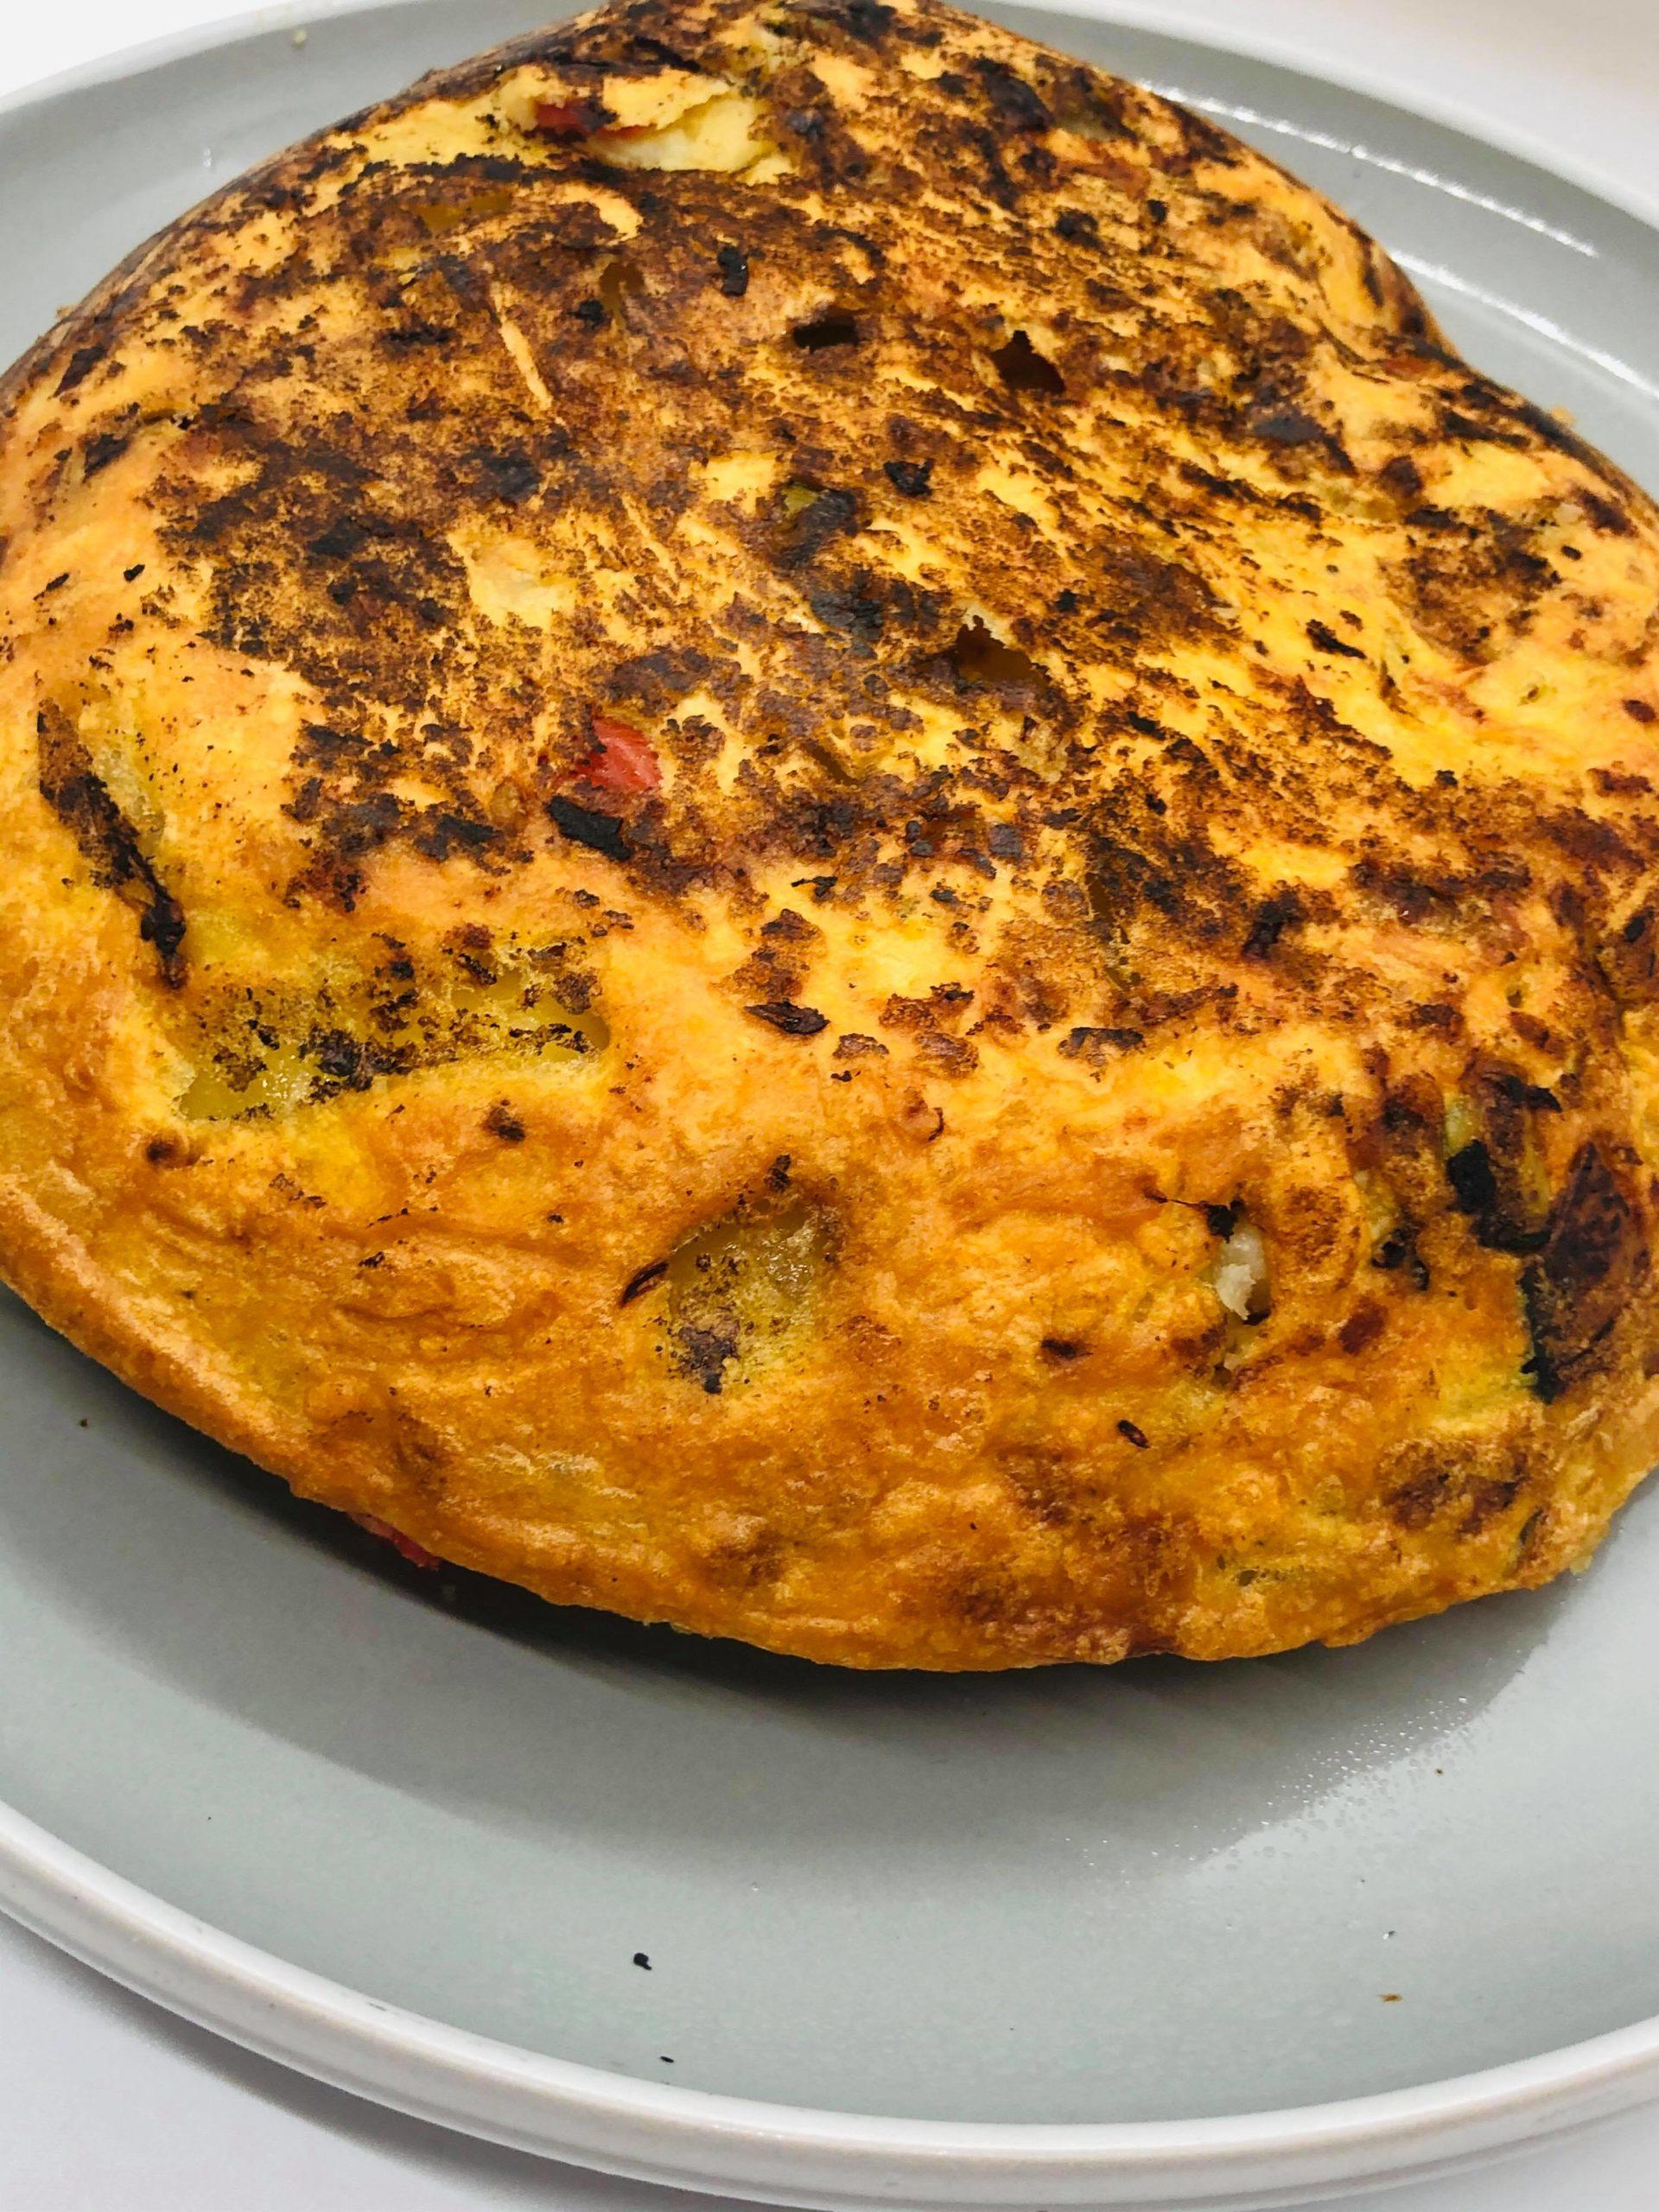 Easy Healthy Vegan Gluten-Free Spanish Tortilla